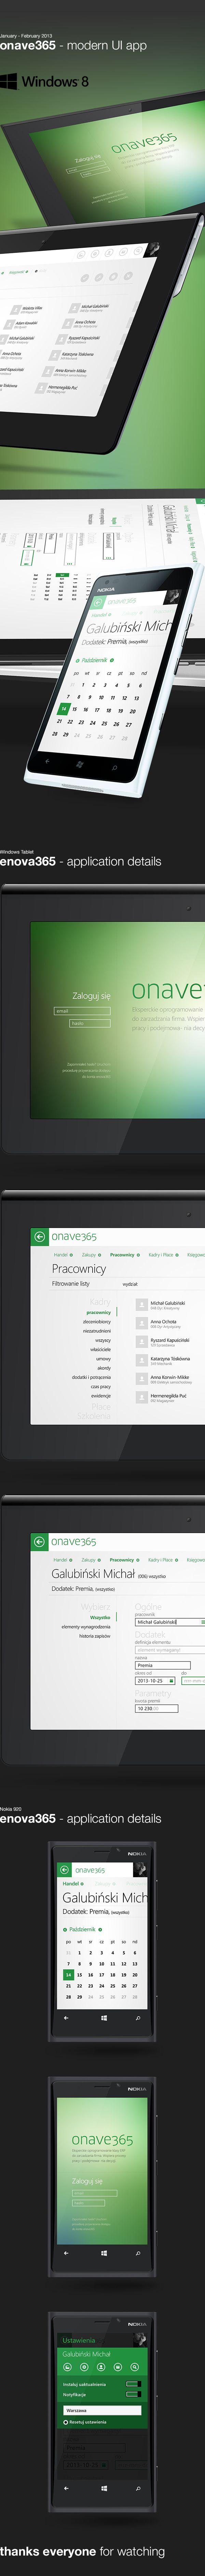 onave365 - Windows 8 app by Michal Galubinski, via Behance